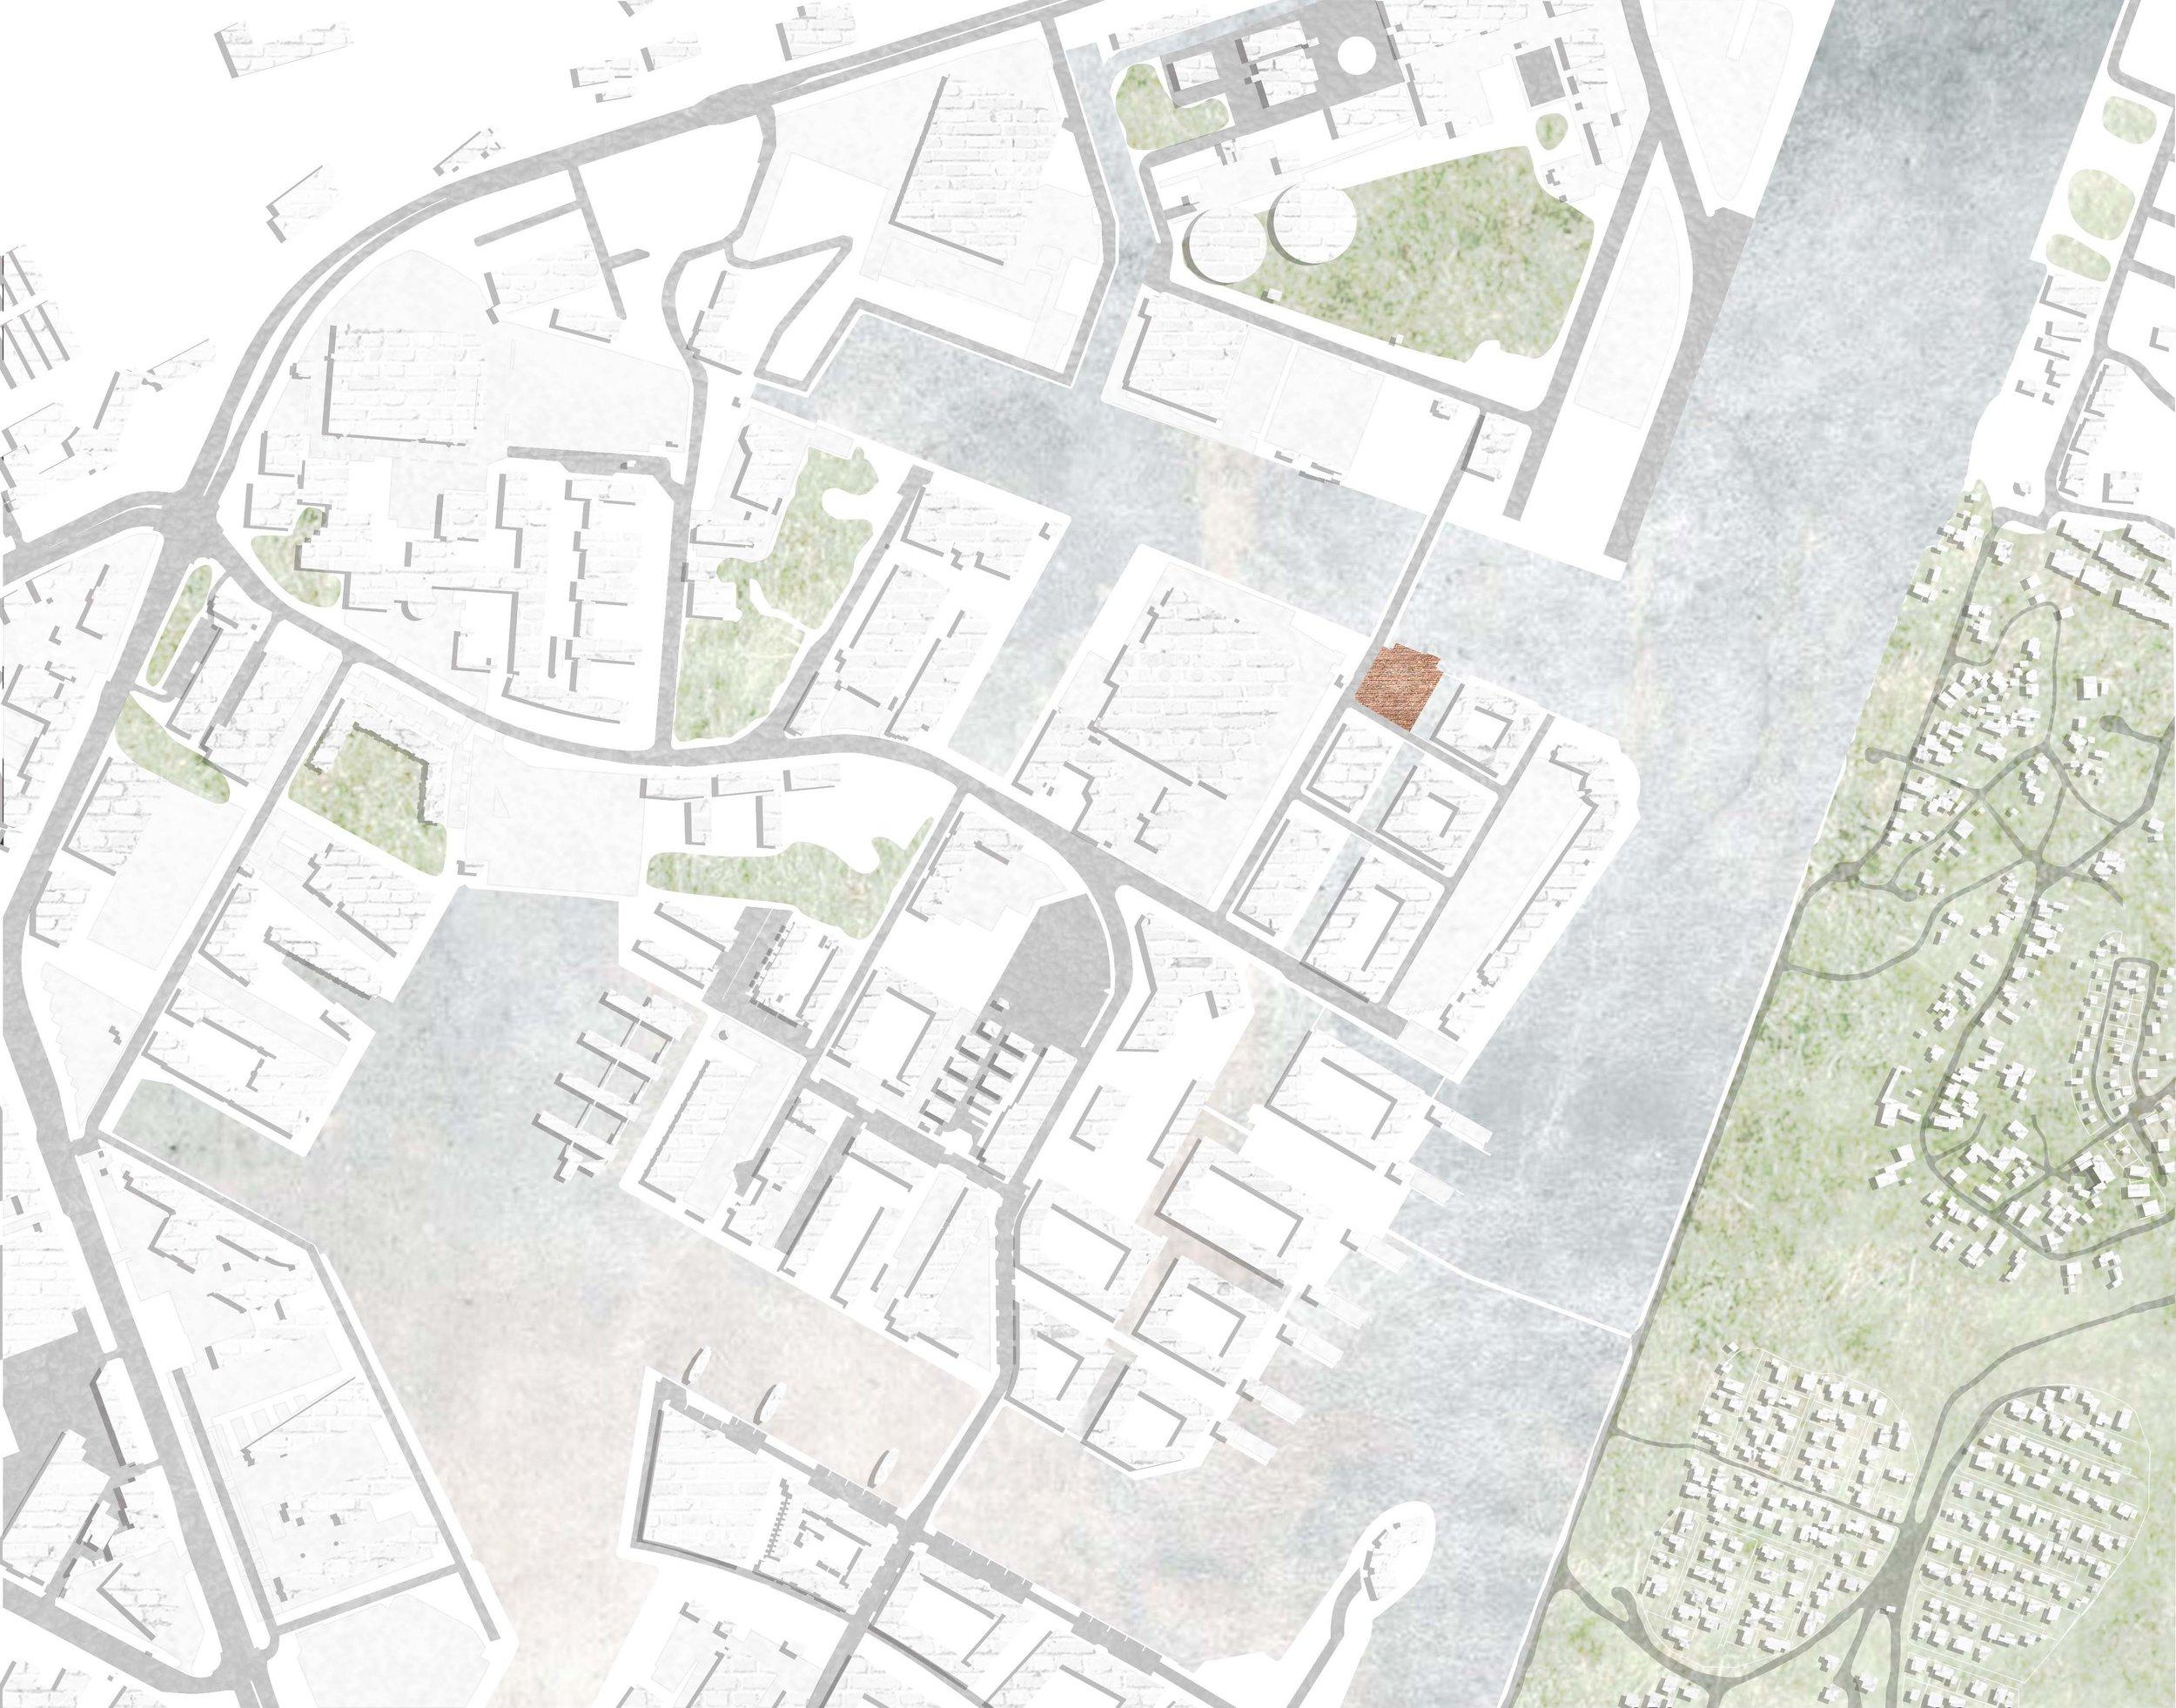 South Harbour Site Plan 1:1000, Megan Blake 2016